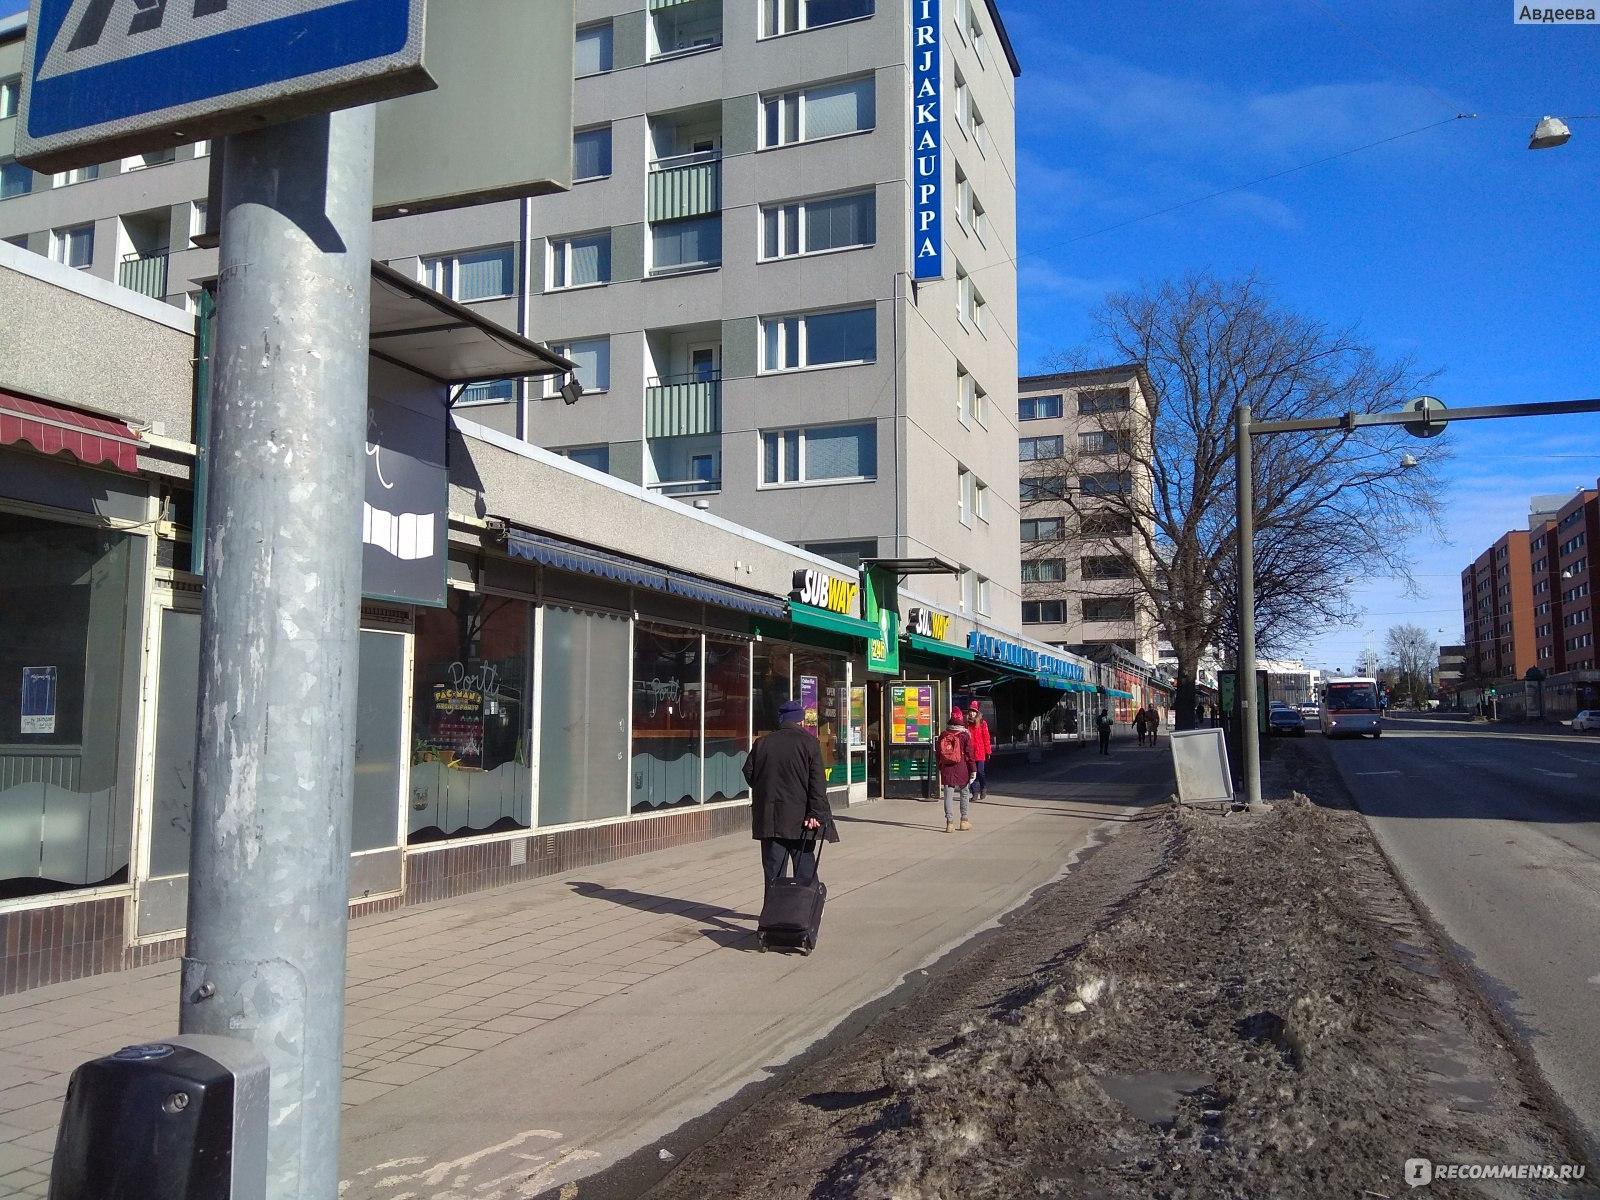 Subway Hämeenkatu